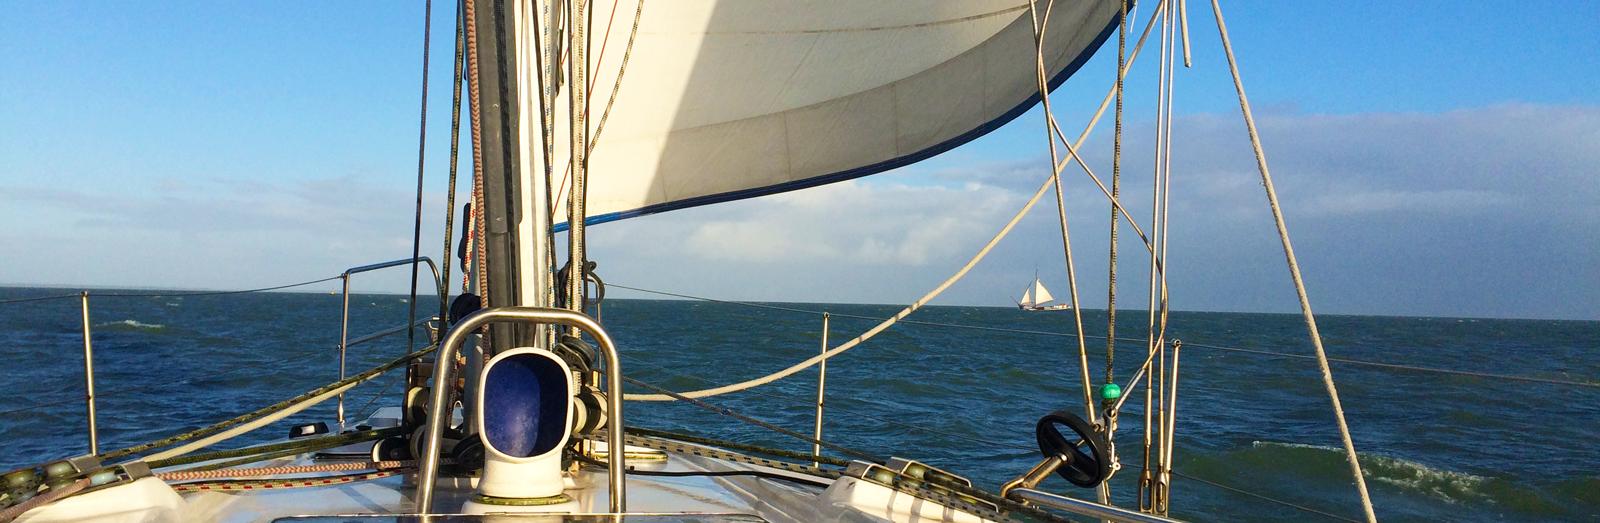 RYA Yachtmaster coastal waypoint amsterdam sailing school